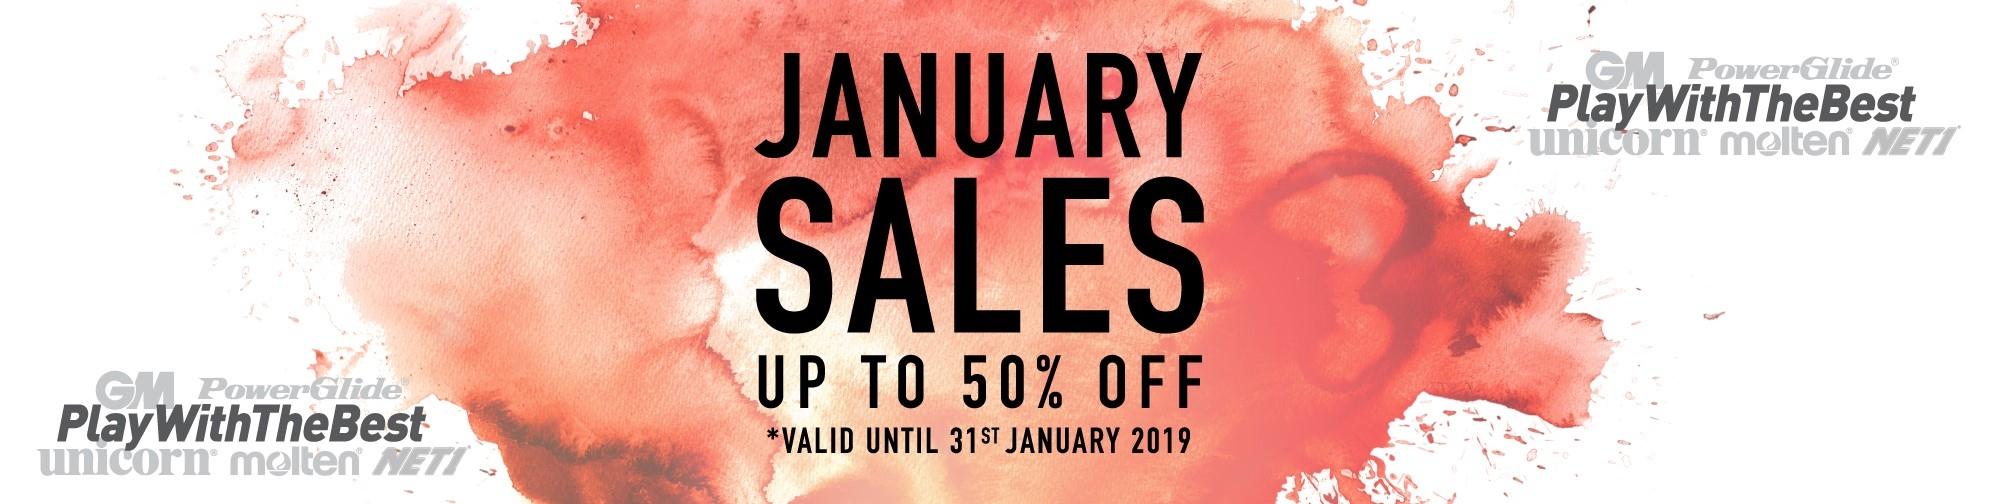 NET1 January Sales